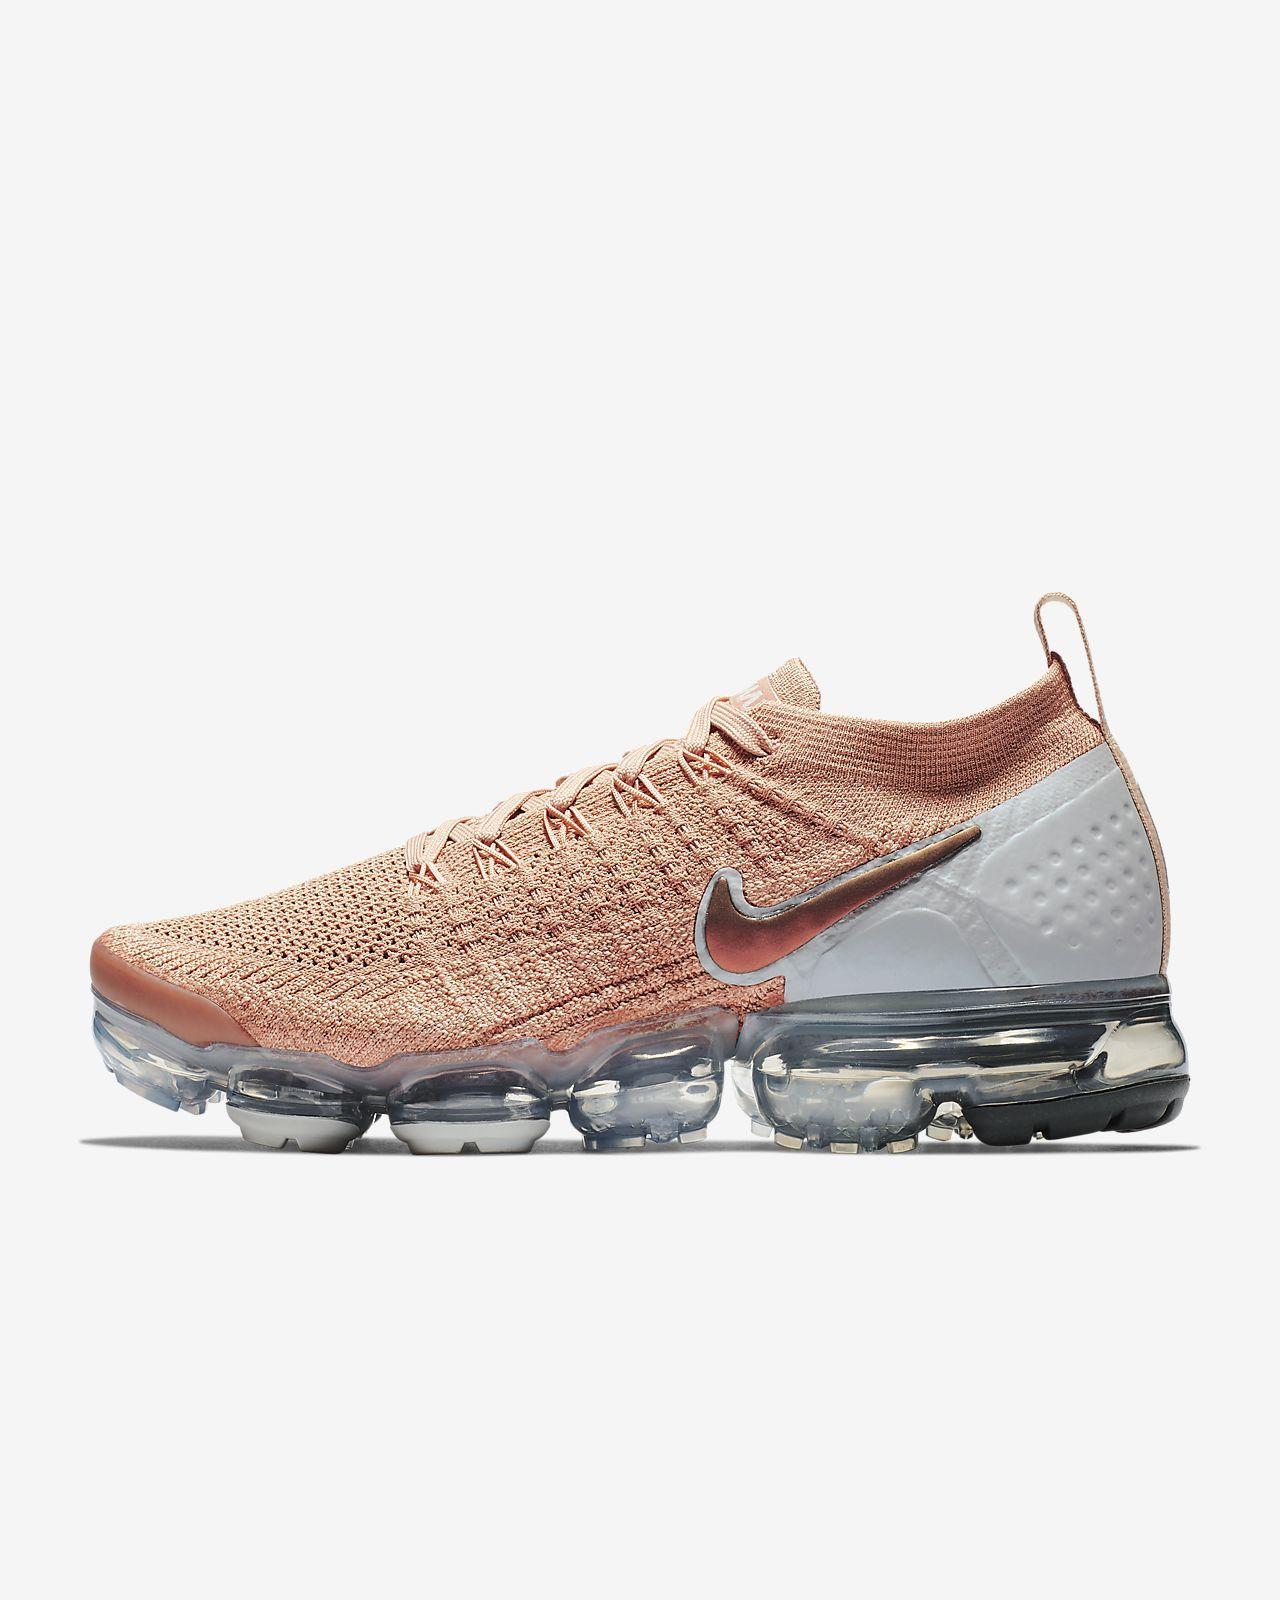 Vetement Nike Running Pas Cher Soldes. Le Dernier Style